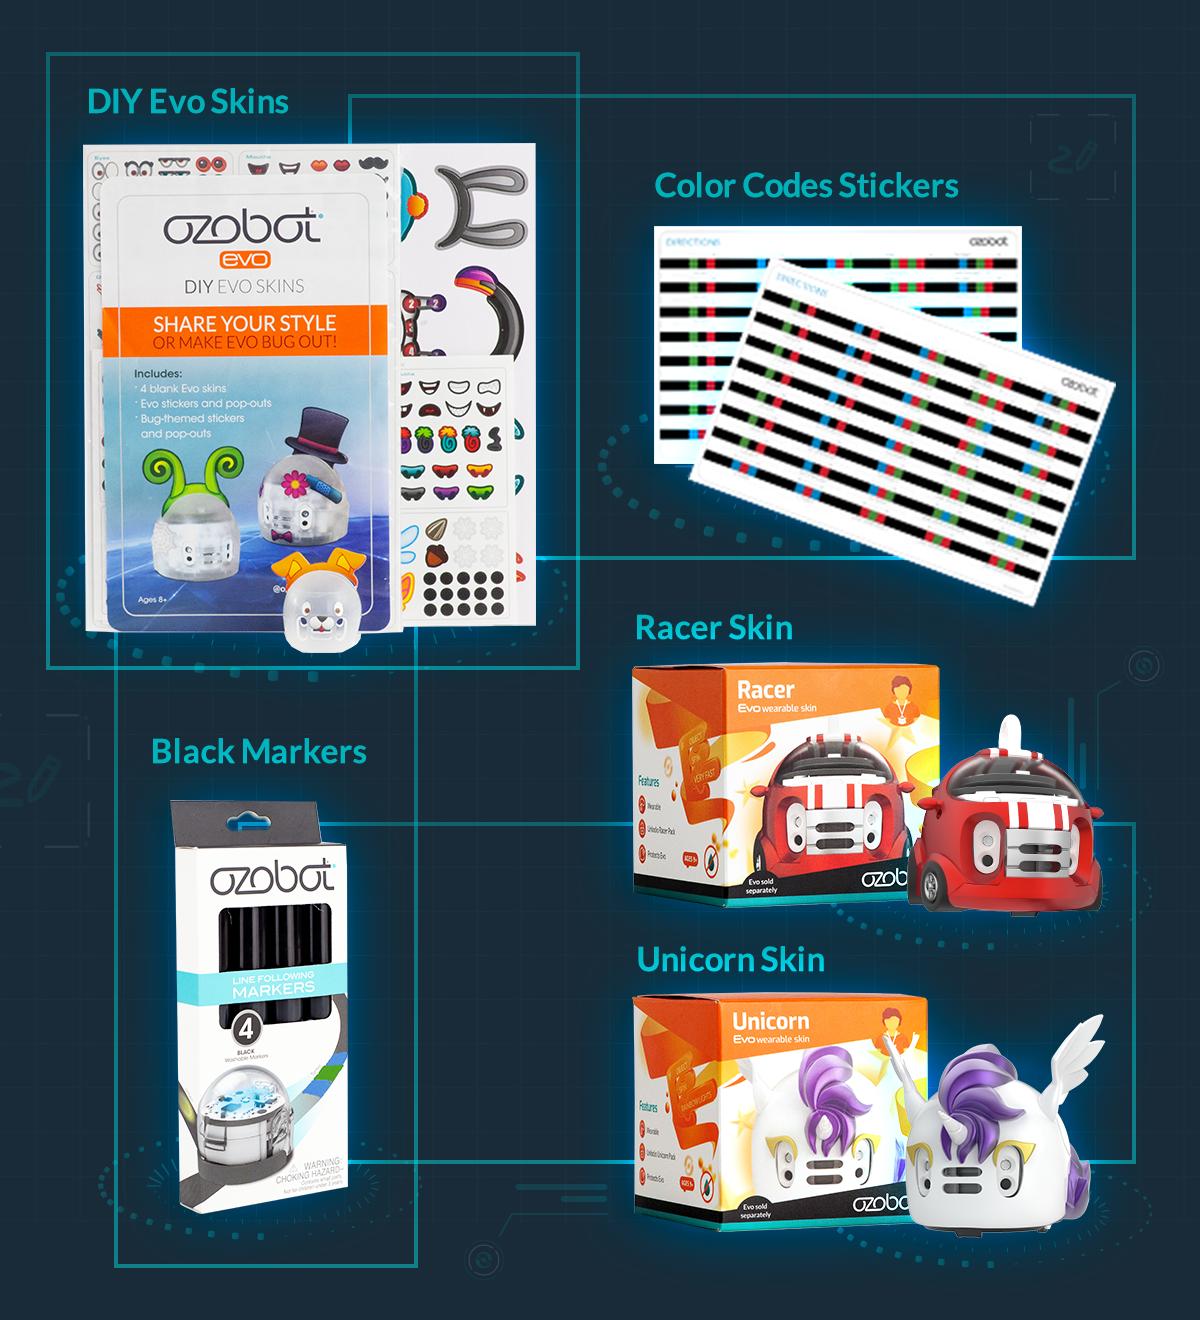 Evo Creator Pack includes DIY Evo Skins, Color Code Stickers, Black Markers, Racer Skin & Unicorn Skin